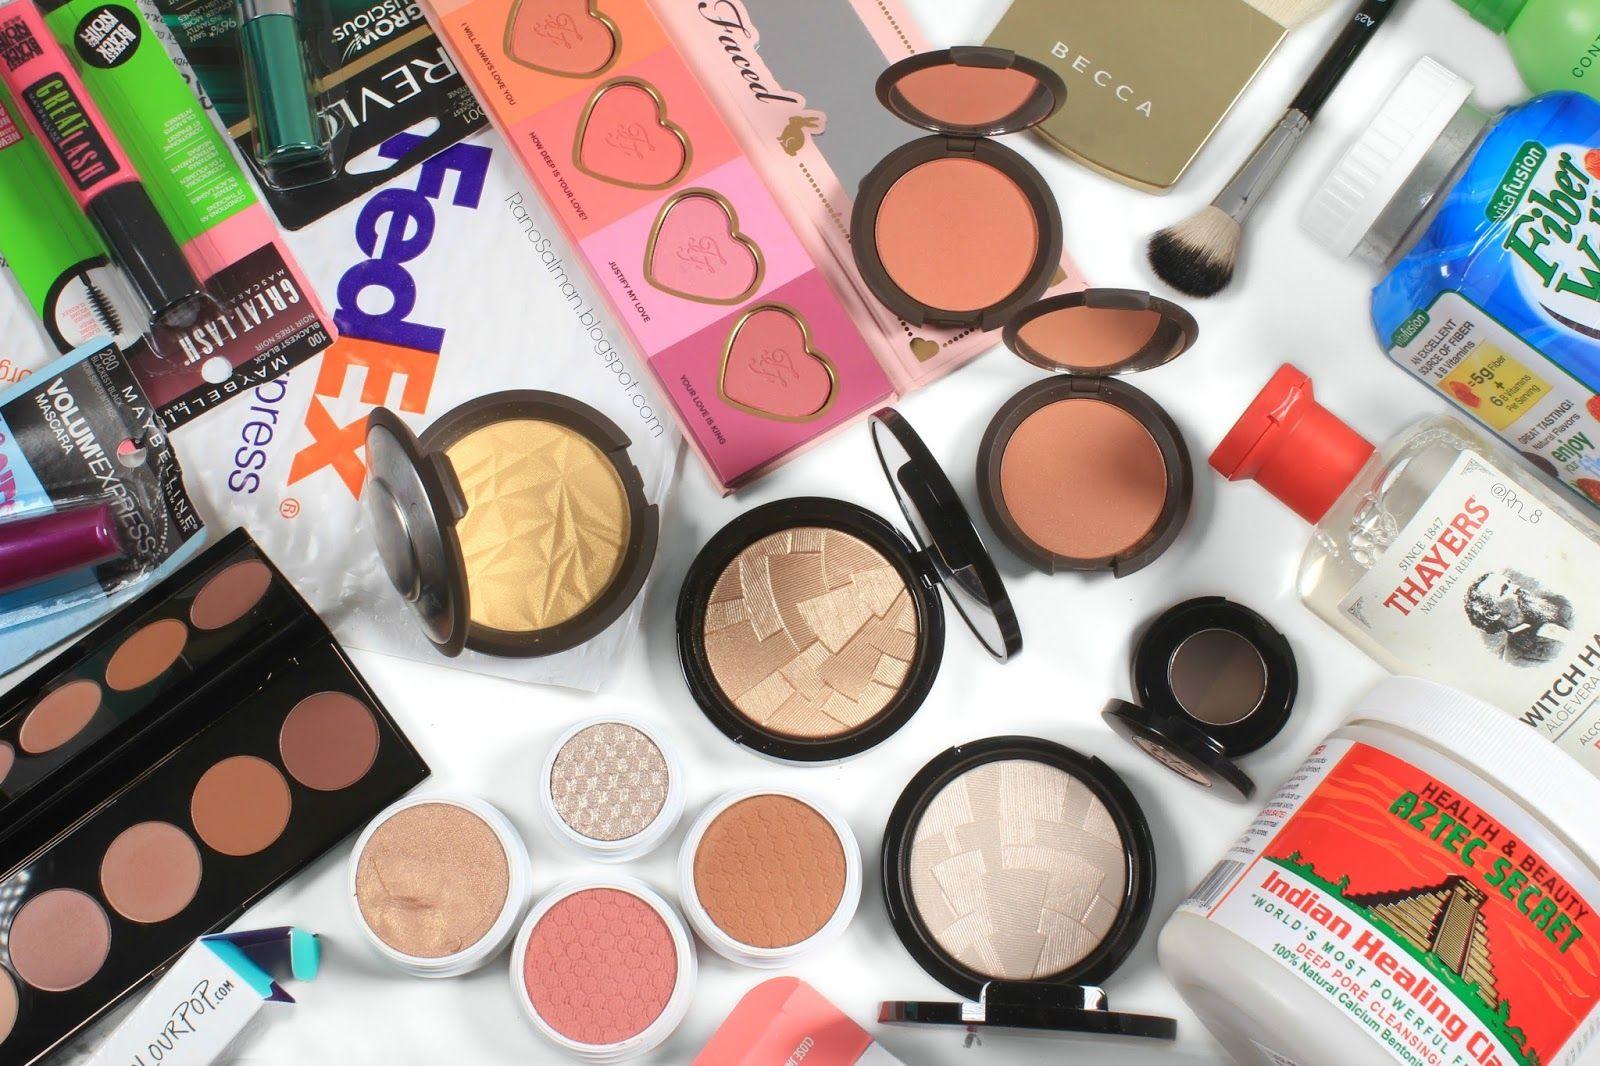 Black Friday And Cyber Monday Haul مشترياتي بالبلاك فرايدي وسايبر مندي Beauty Eyeshadow Makeup